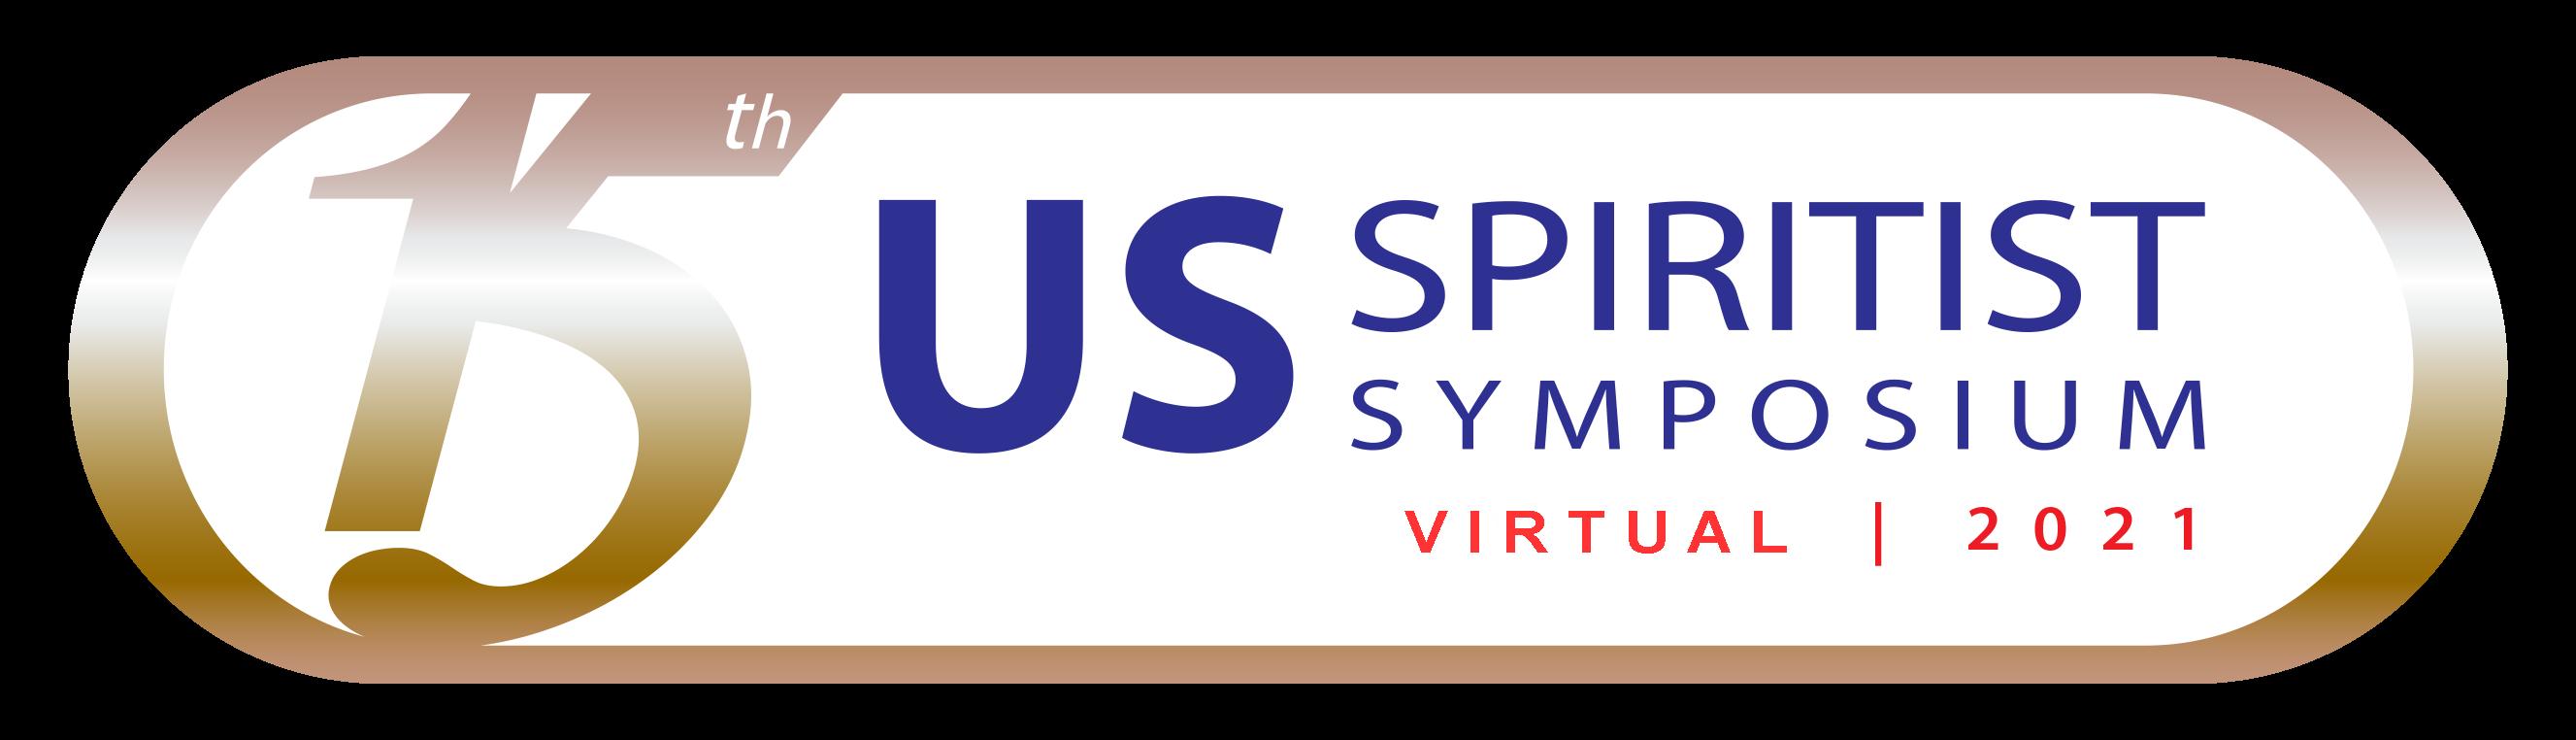 U.S. Spiritist Symposium